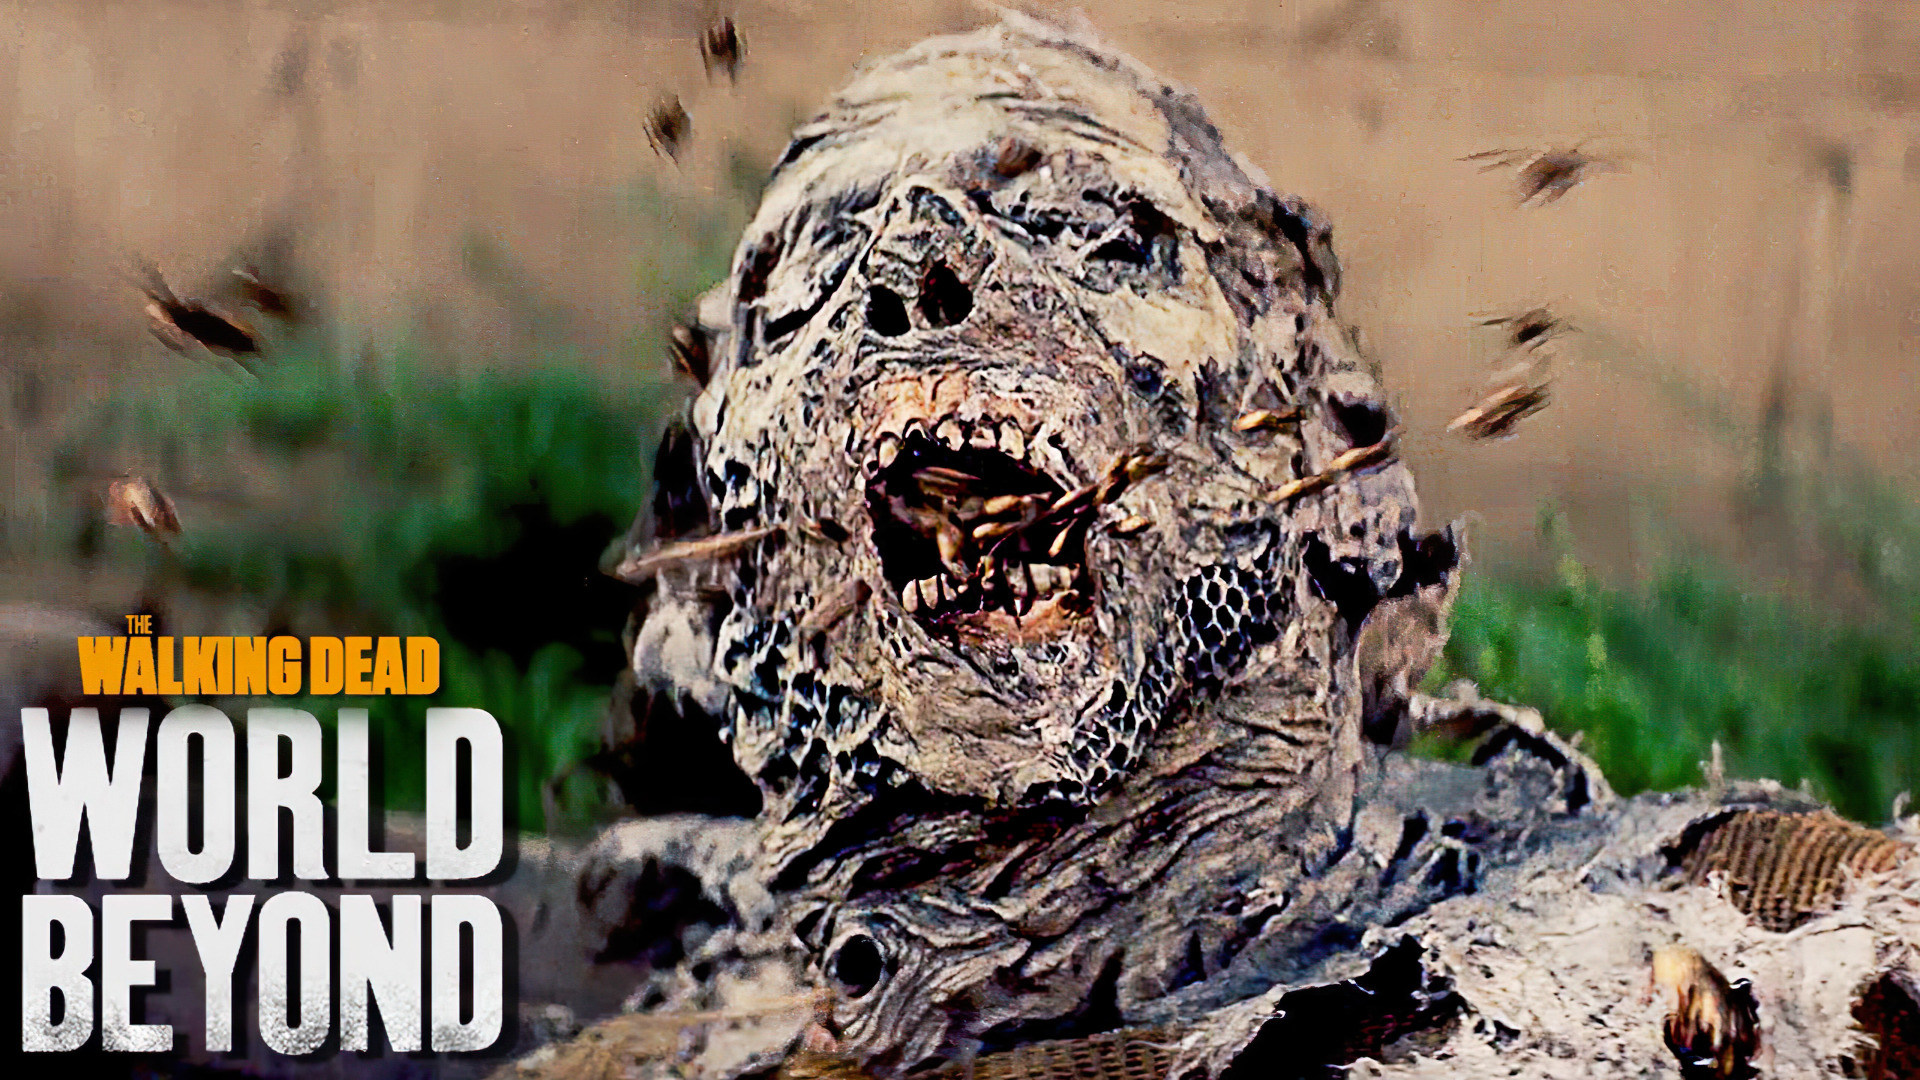 Trailer, Serie, Amazon Prime, Amazon Prime Video, Zombies, Prime Video, The Walking Dead, AMC, The Walking Dead: World Beyond, World Beyond, The Walking Dead World Beyond